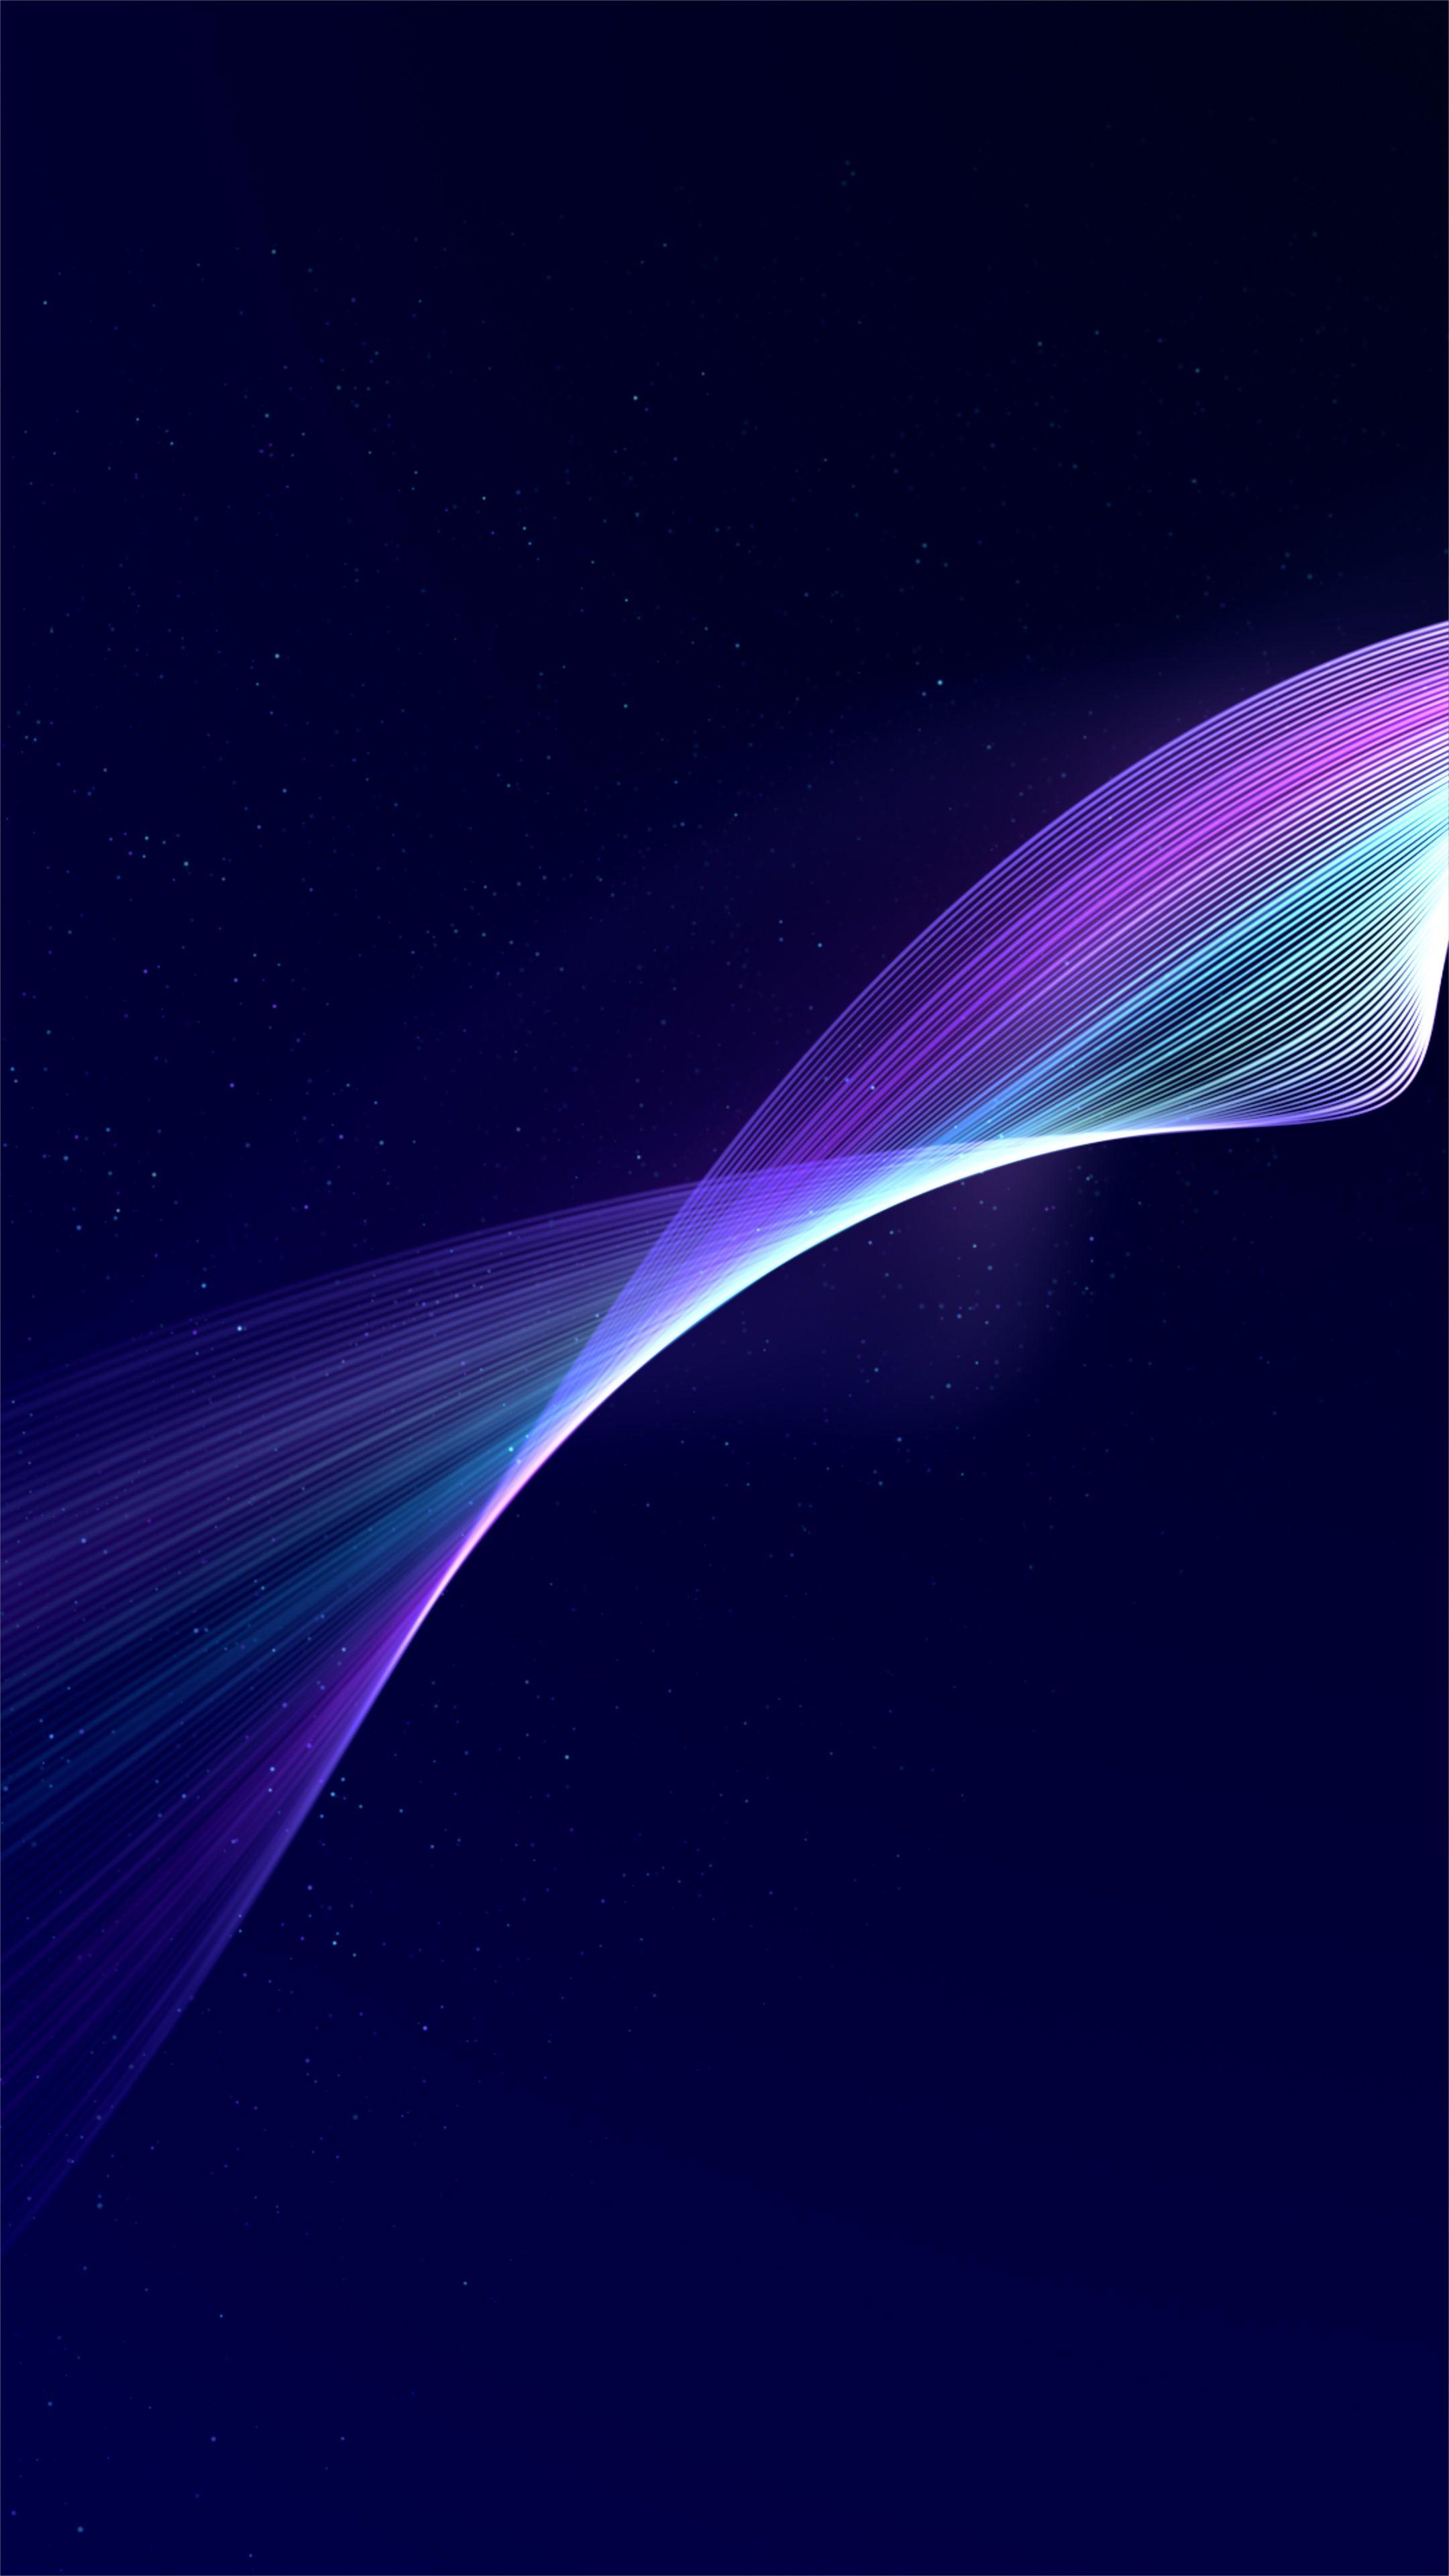 Light Blue Aesthetic Wallpaper Hd